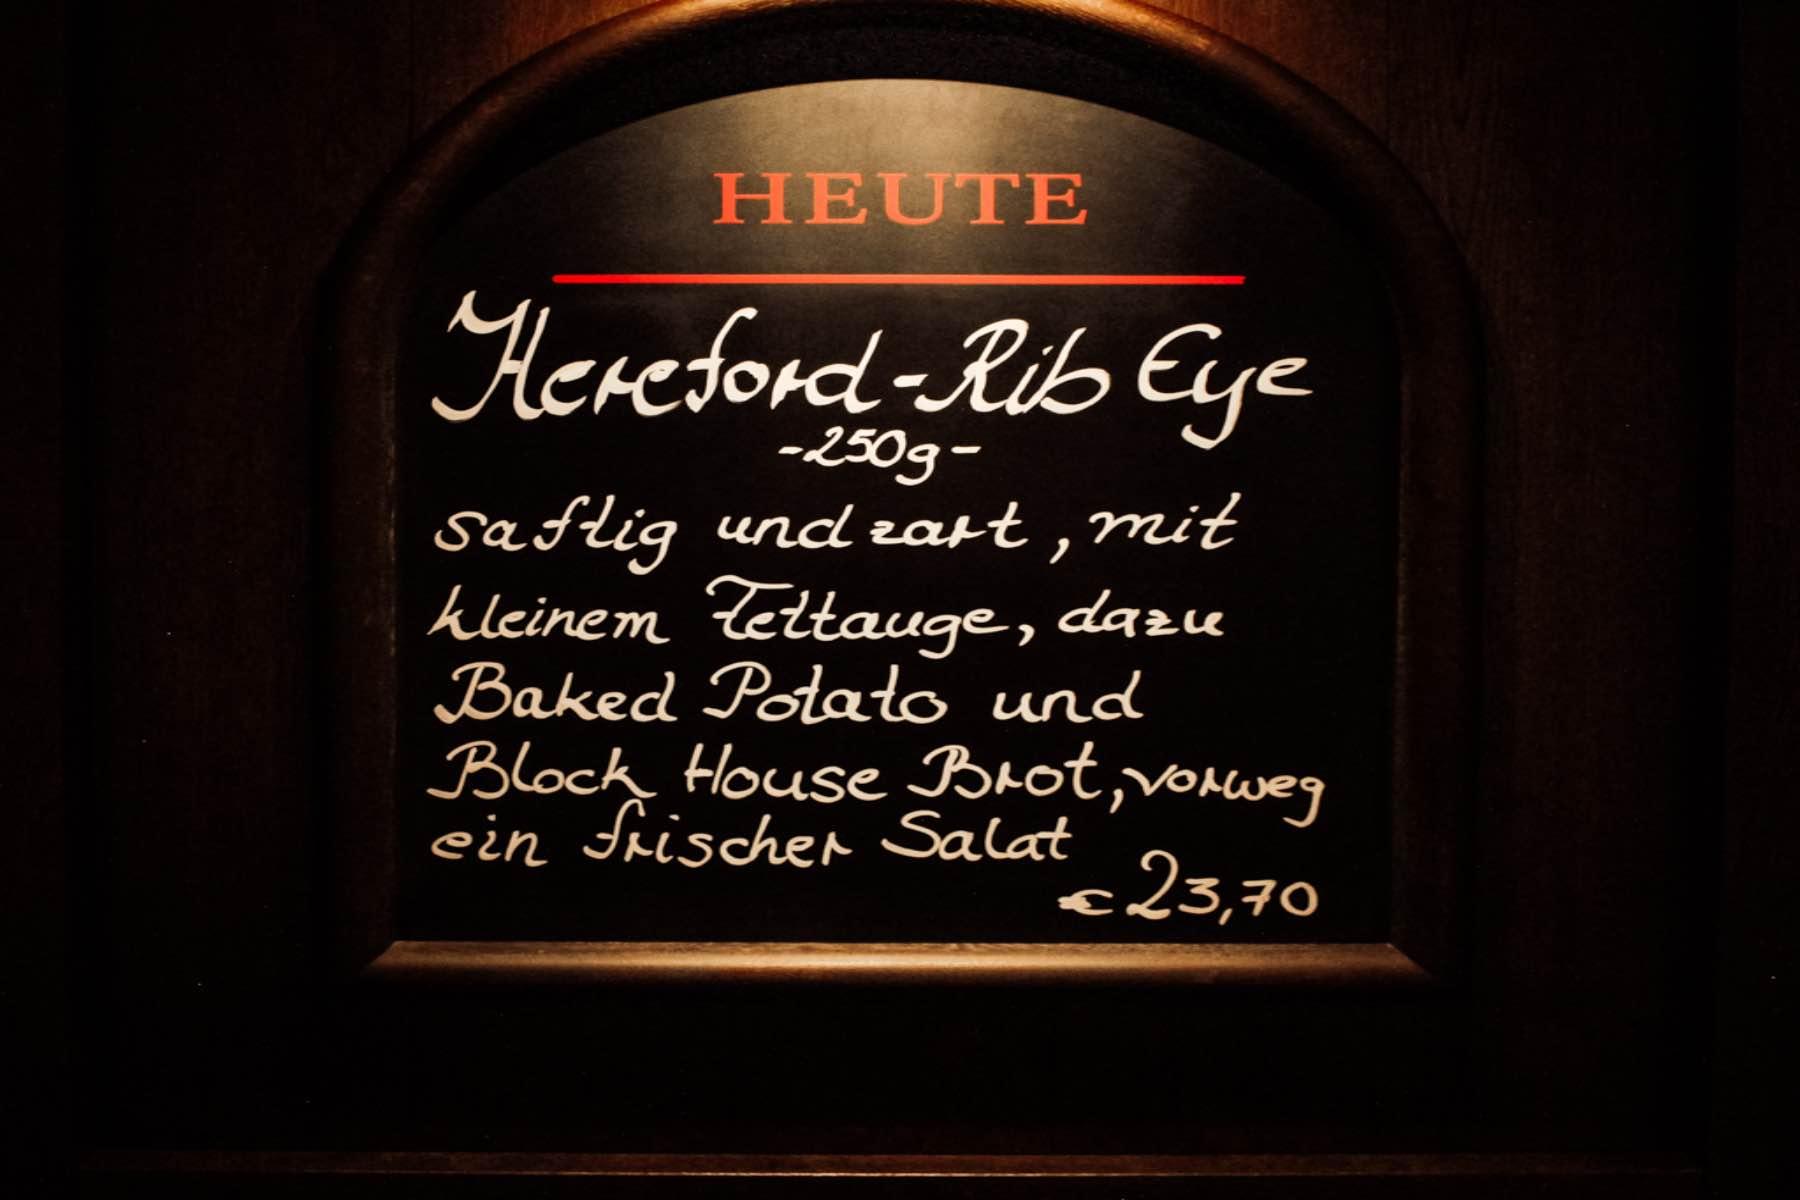 geheimtipp Augsburg Blockhouse